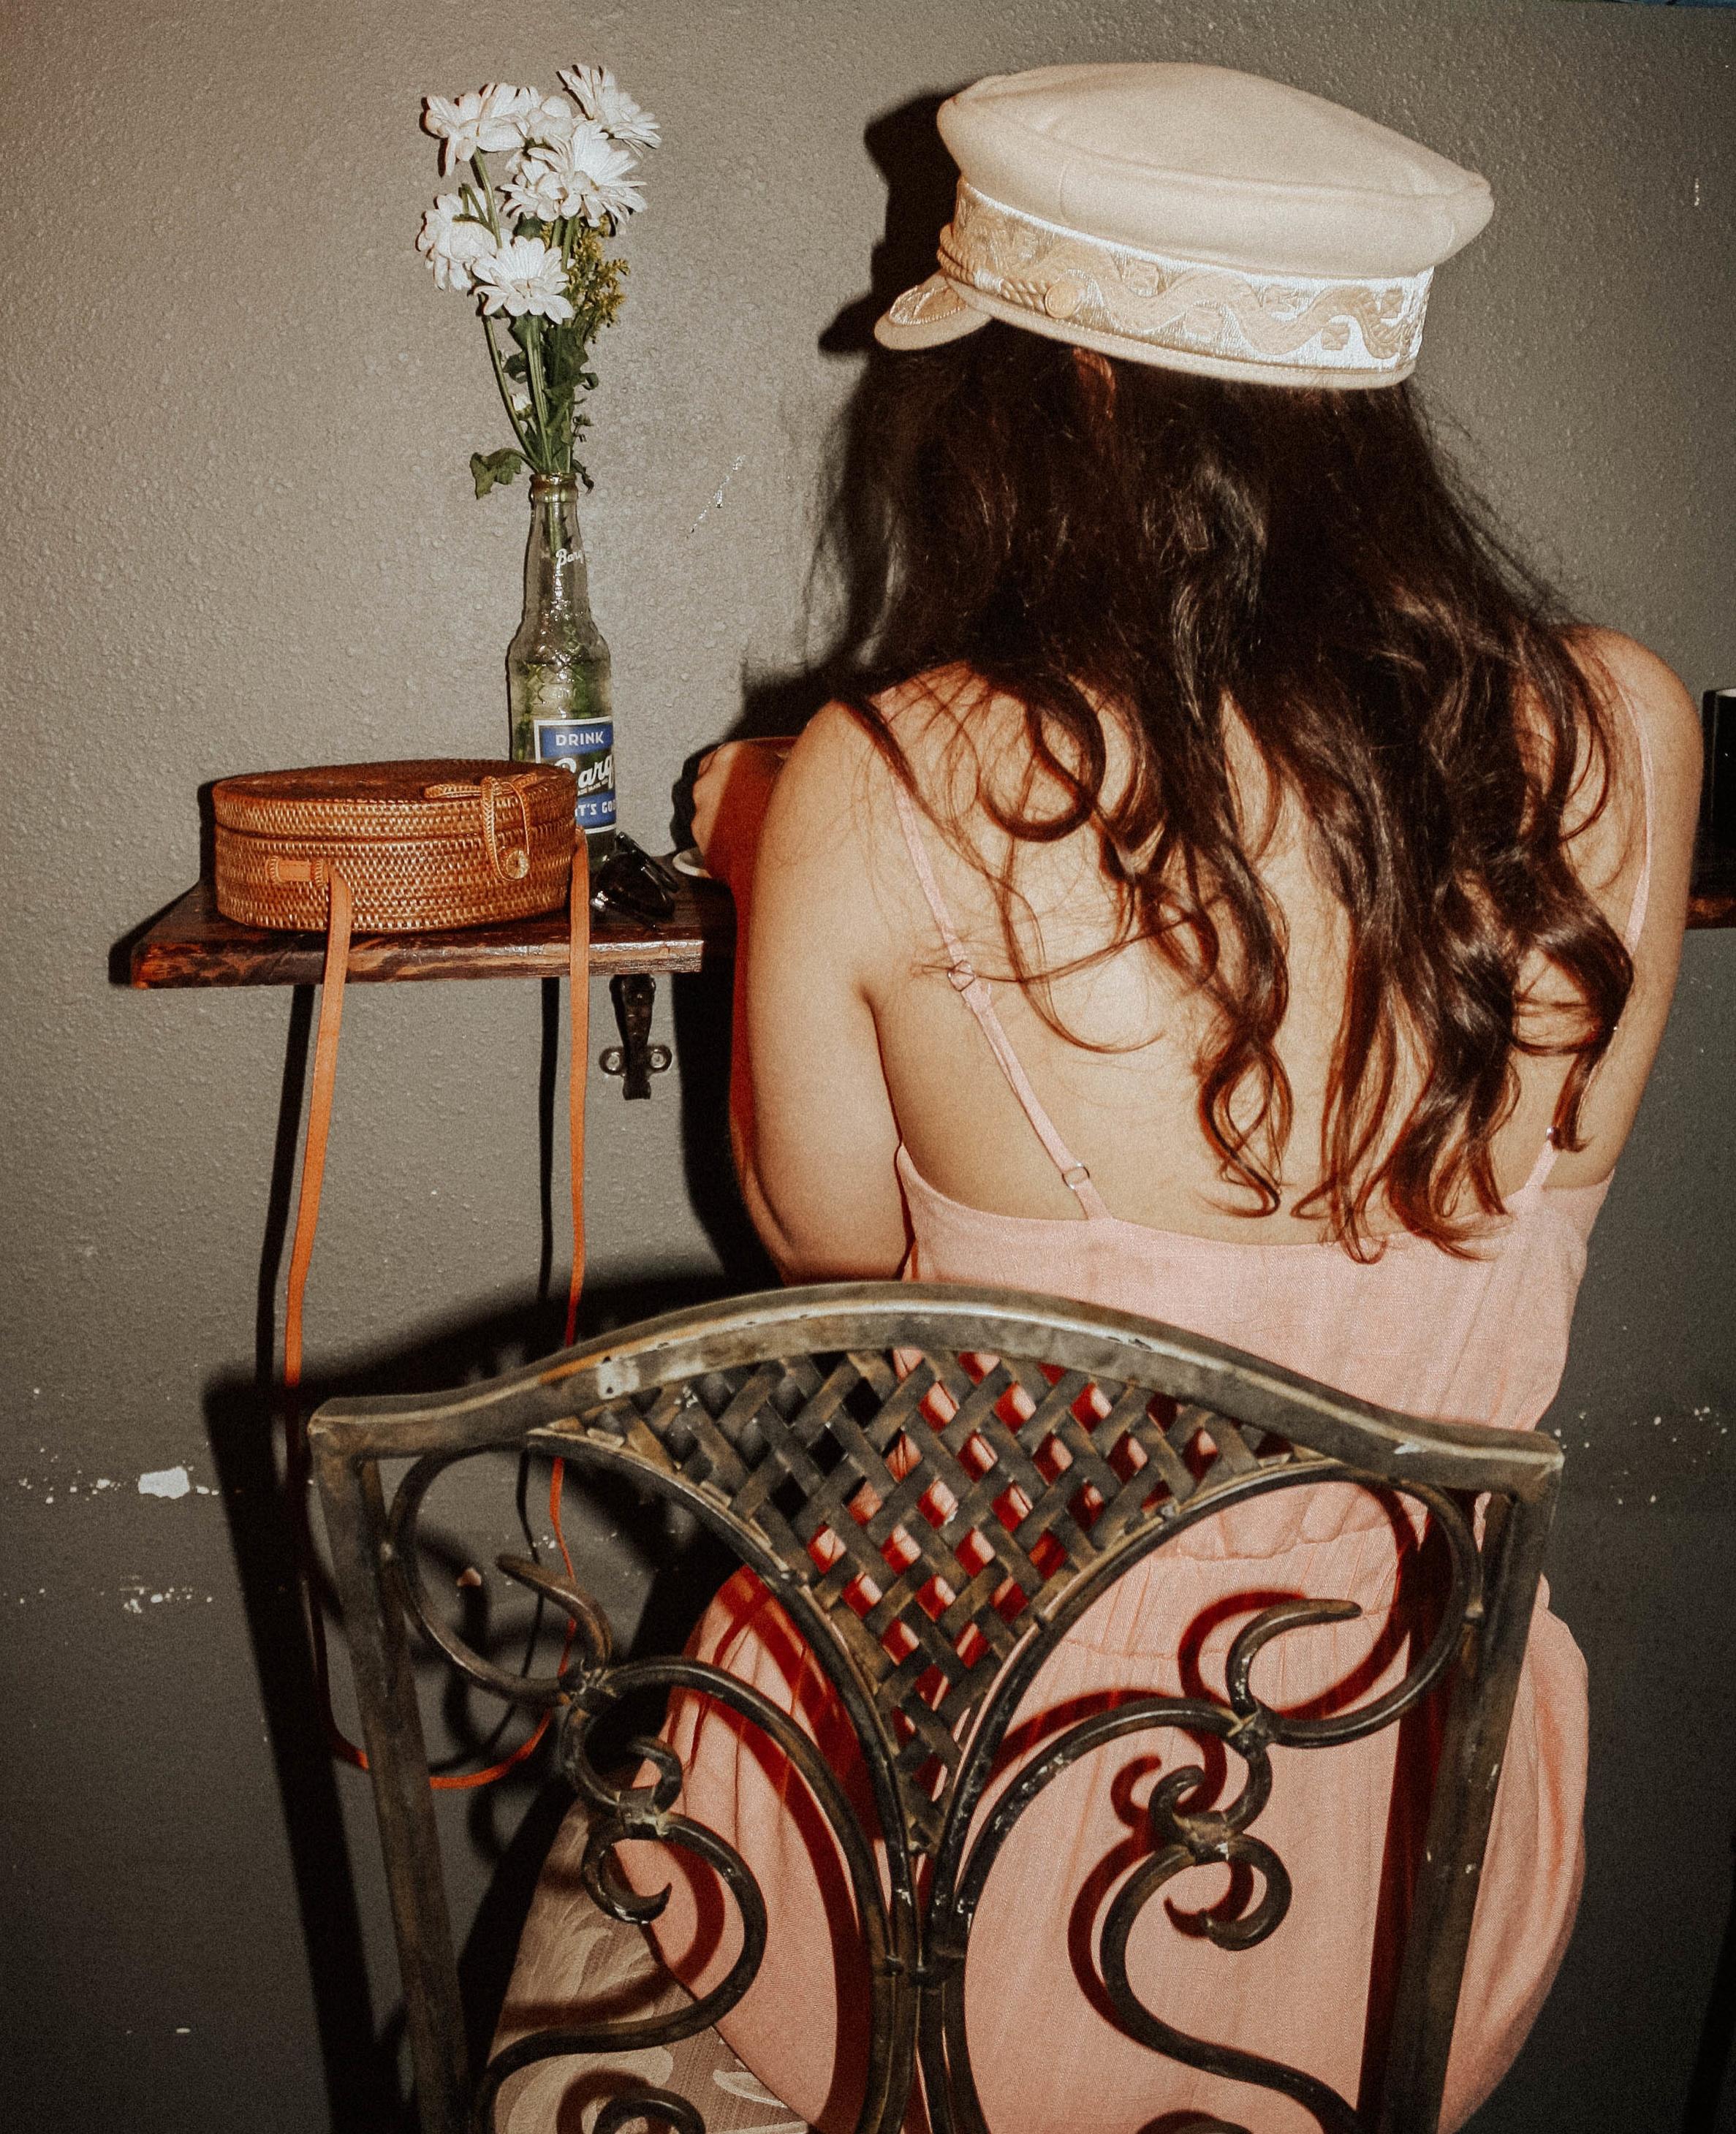 Purse: Cleobella; Hat: Lack of Colors